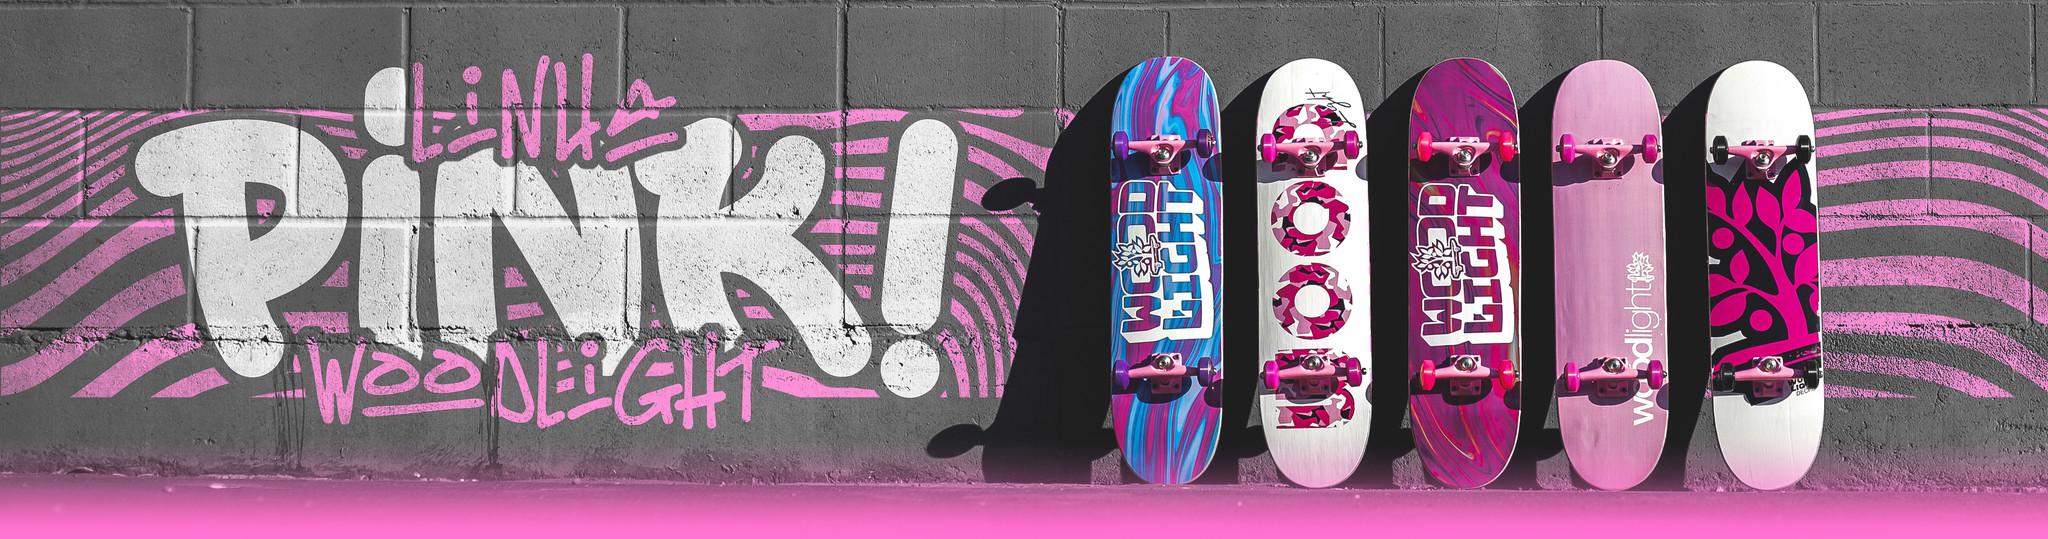 Skate Pink